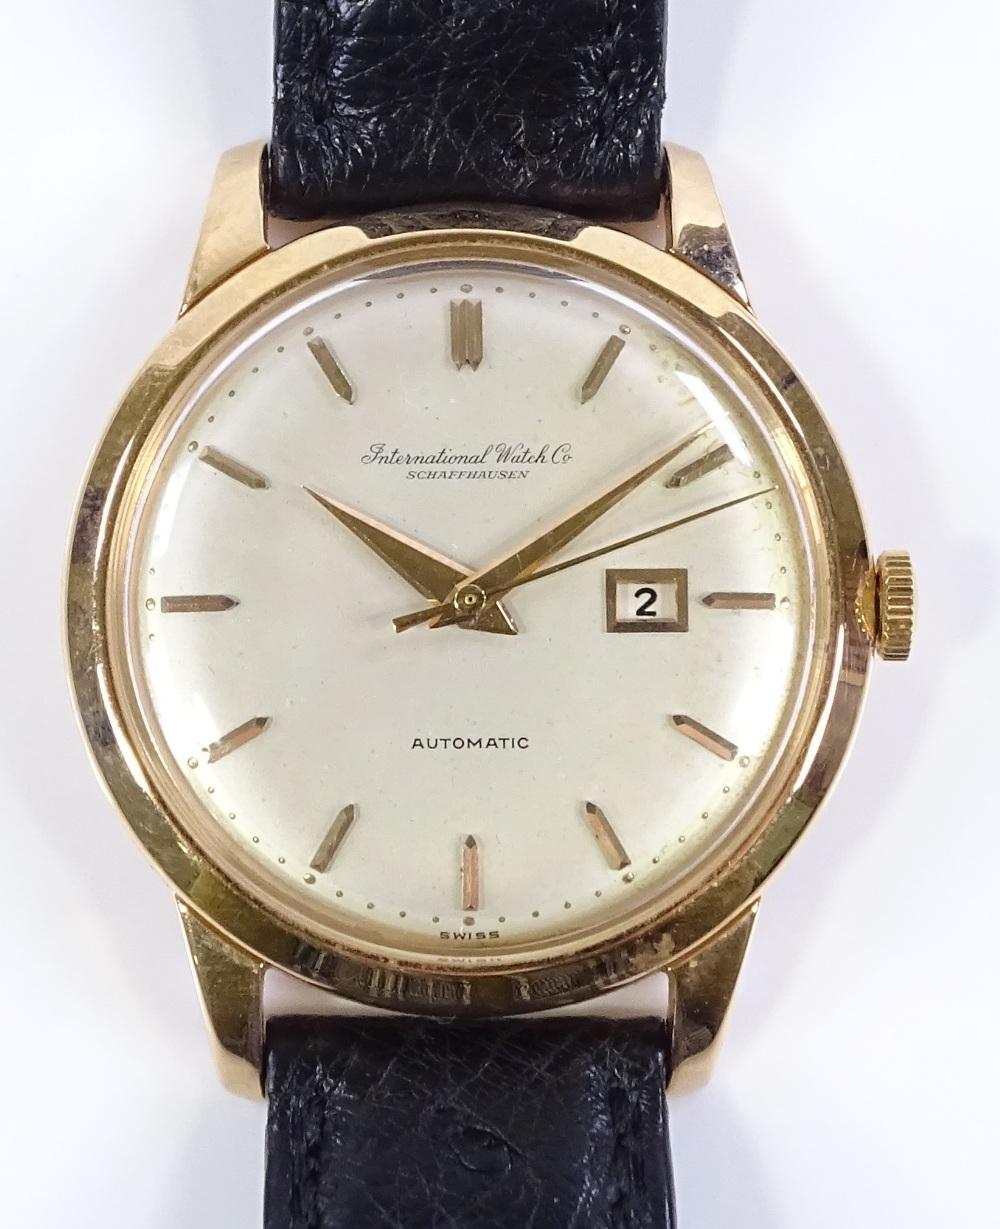 Lot 300 - An 18ct gold International Watch Company (IWC) Schaffhausen Automatic wristwatch, circa 1950s,